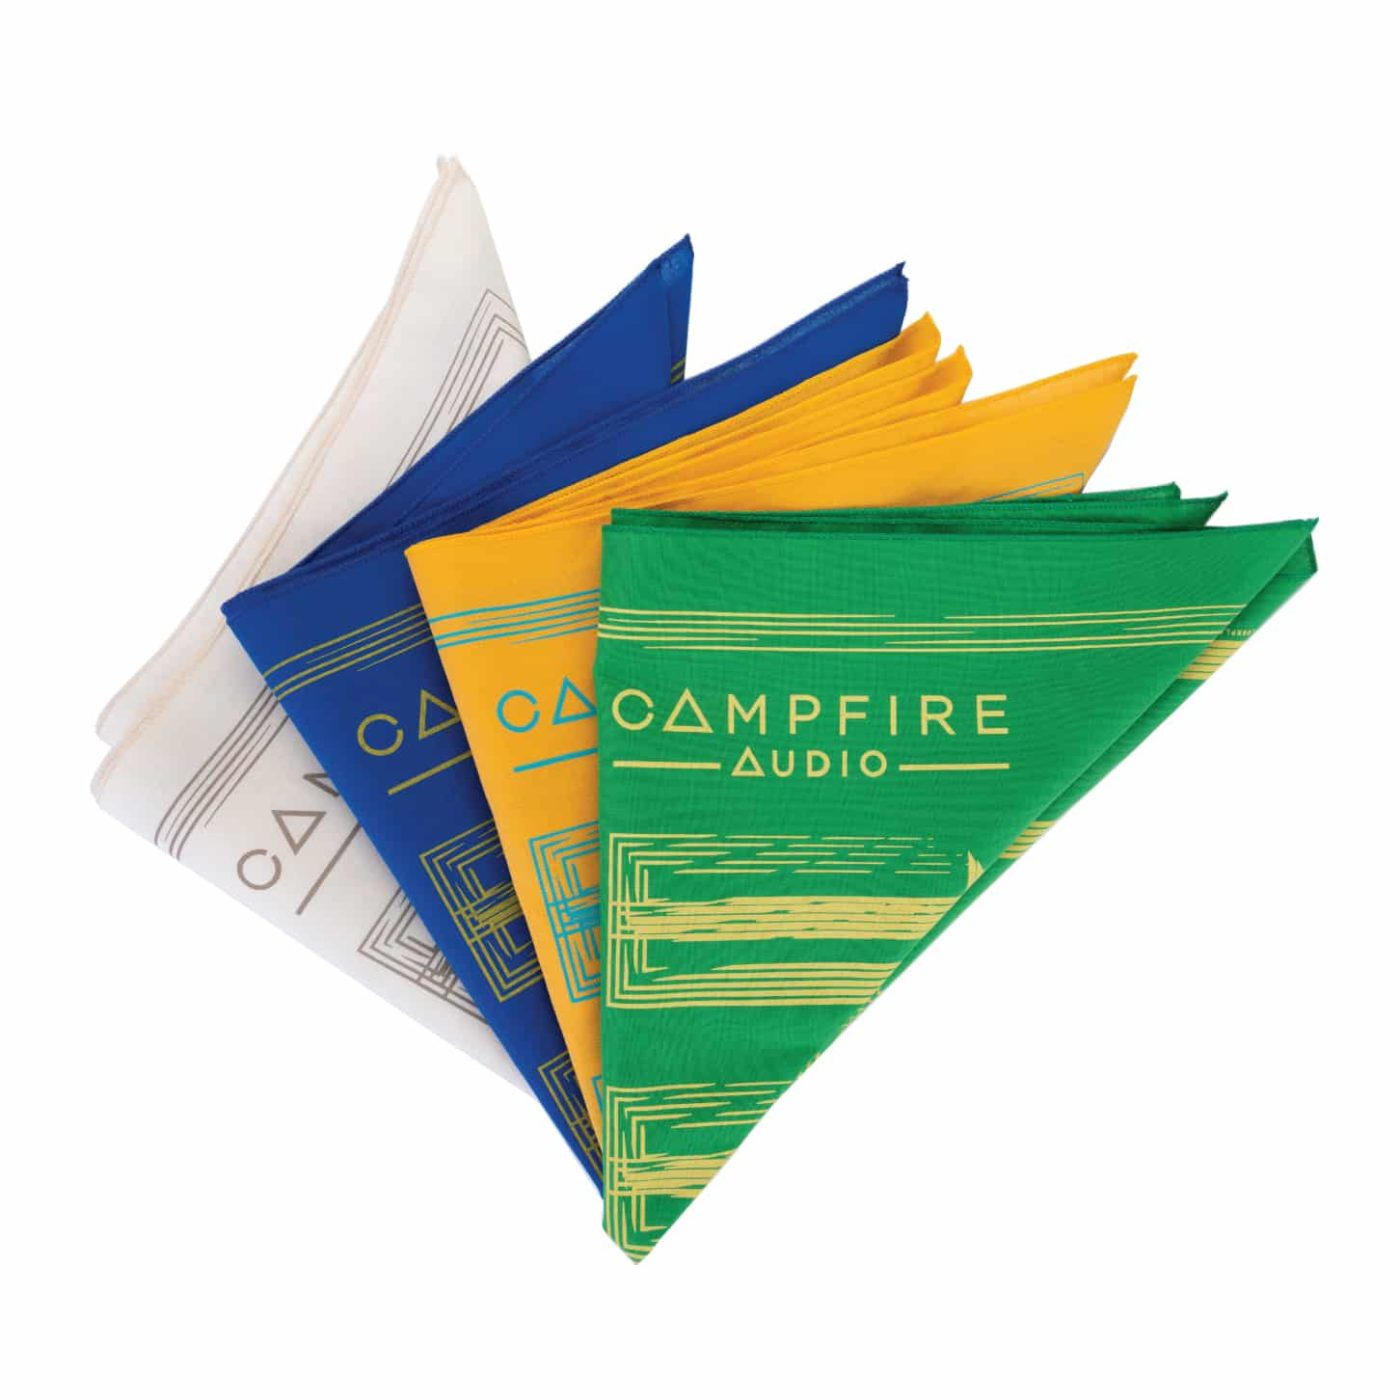 campfire audio workshop floorplan bandana assortment